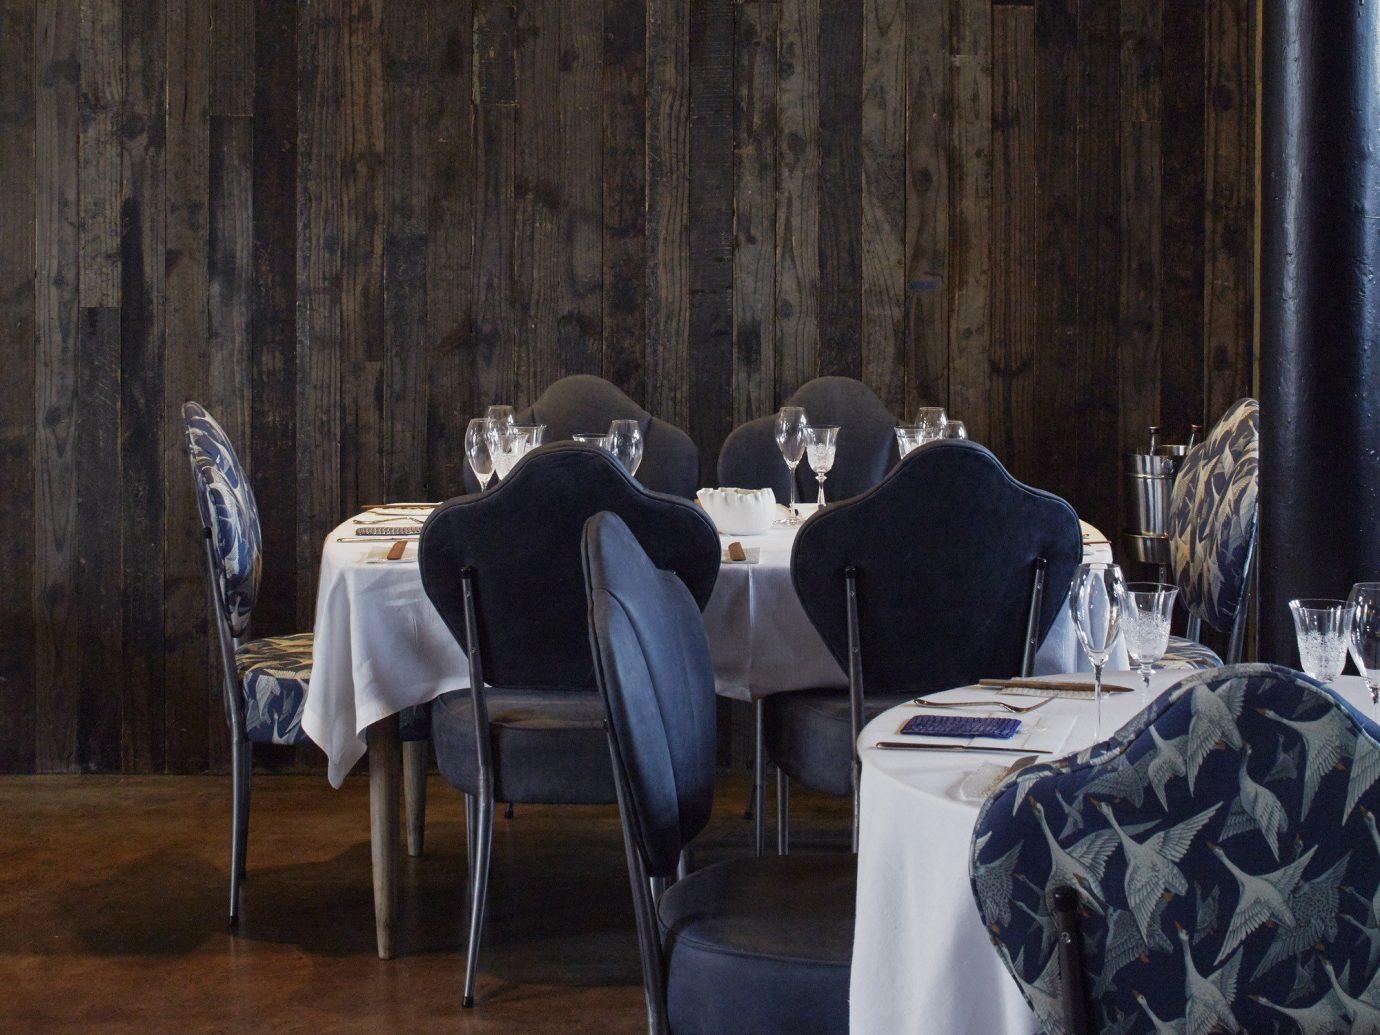 Food + Drink floor indoor room interior design wood lighting table furniture